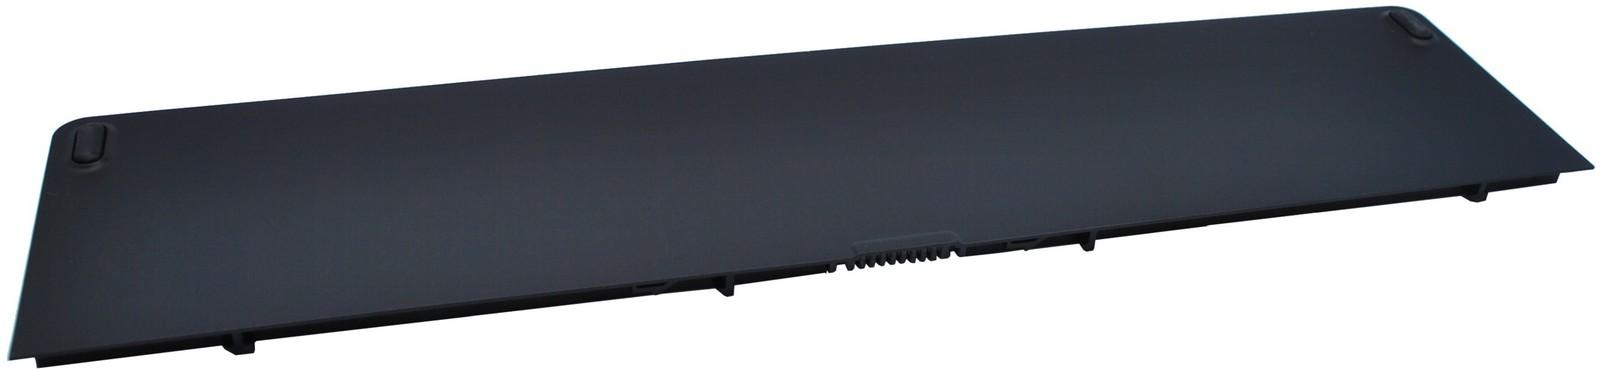 MicroBattery Laptop Battery for Dell 44Wh 4 Cell Li-Pol 7.4V 5.8Ah MBXDE-BA0148 - eet01